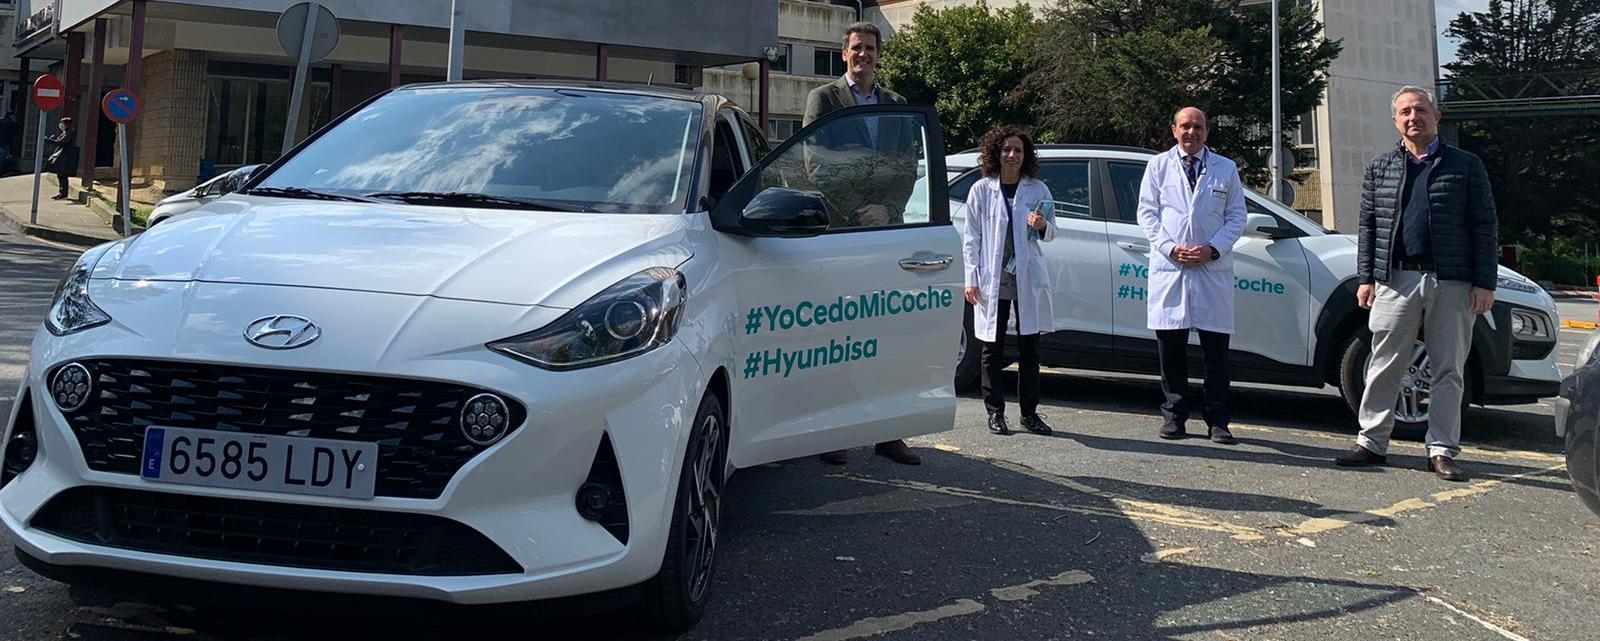 Hyundai hace extensiva la iniciativa #YoCedoMiCoche al resto de España